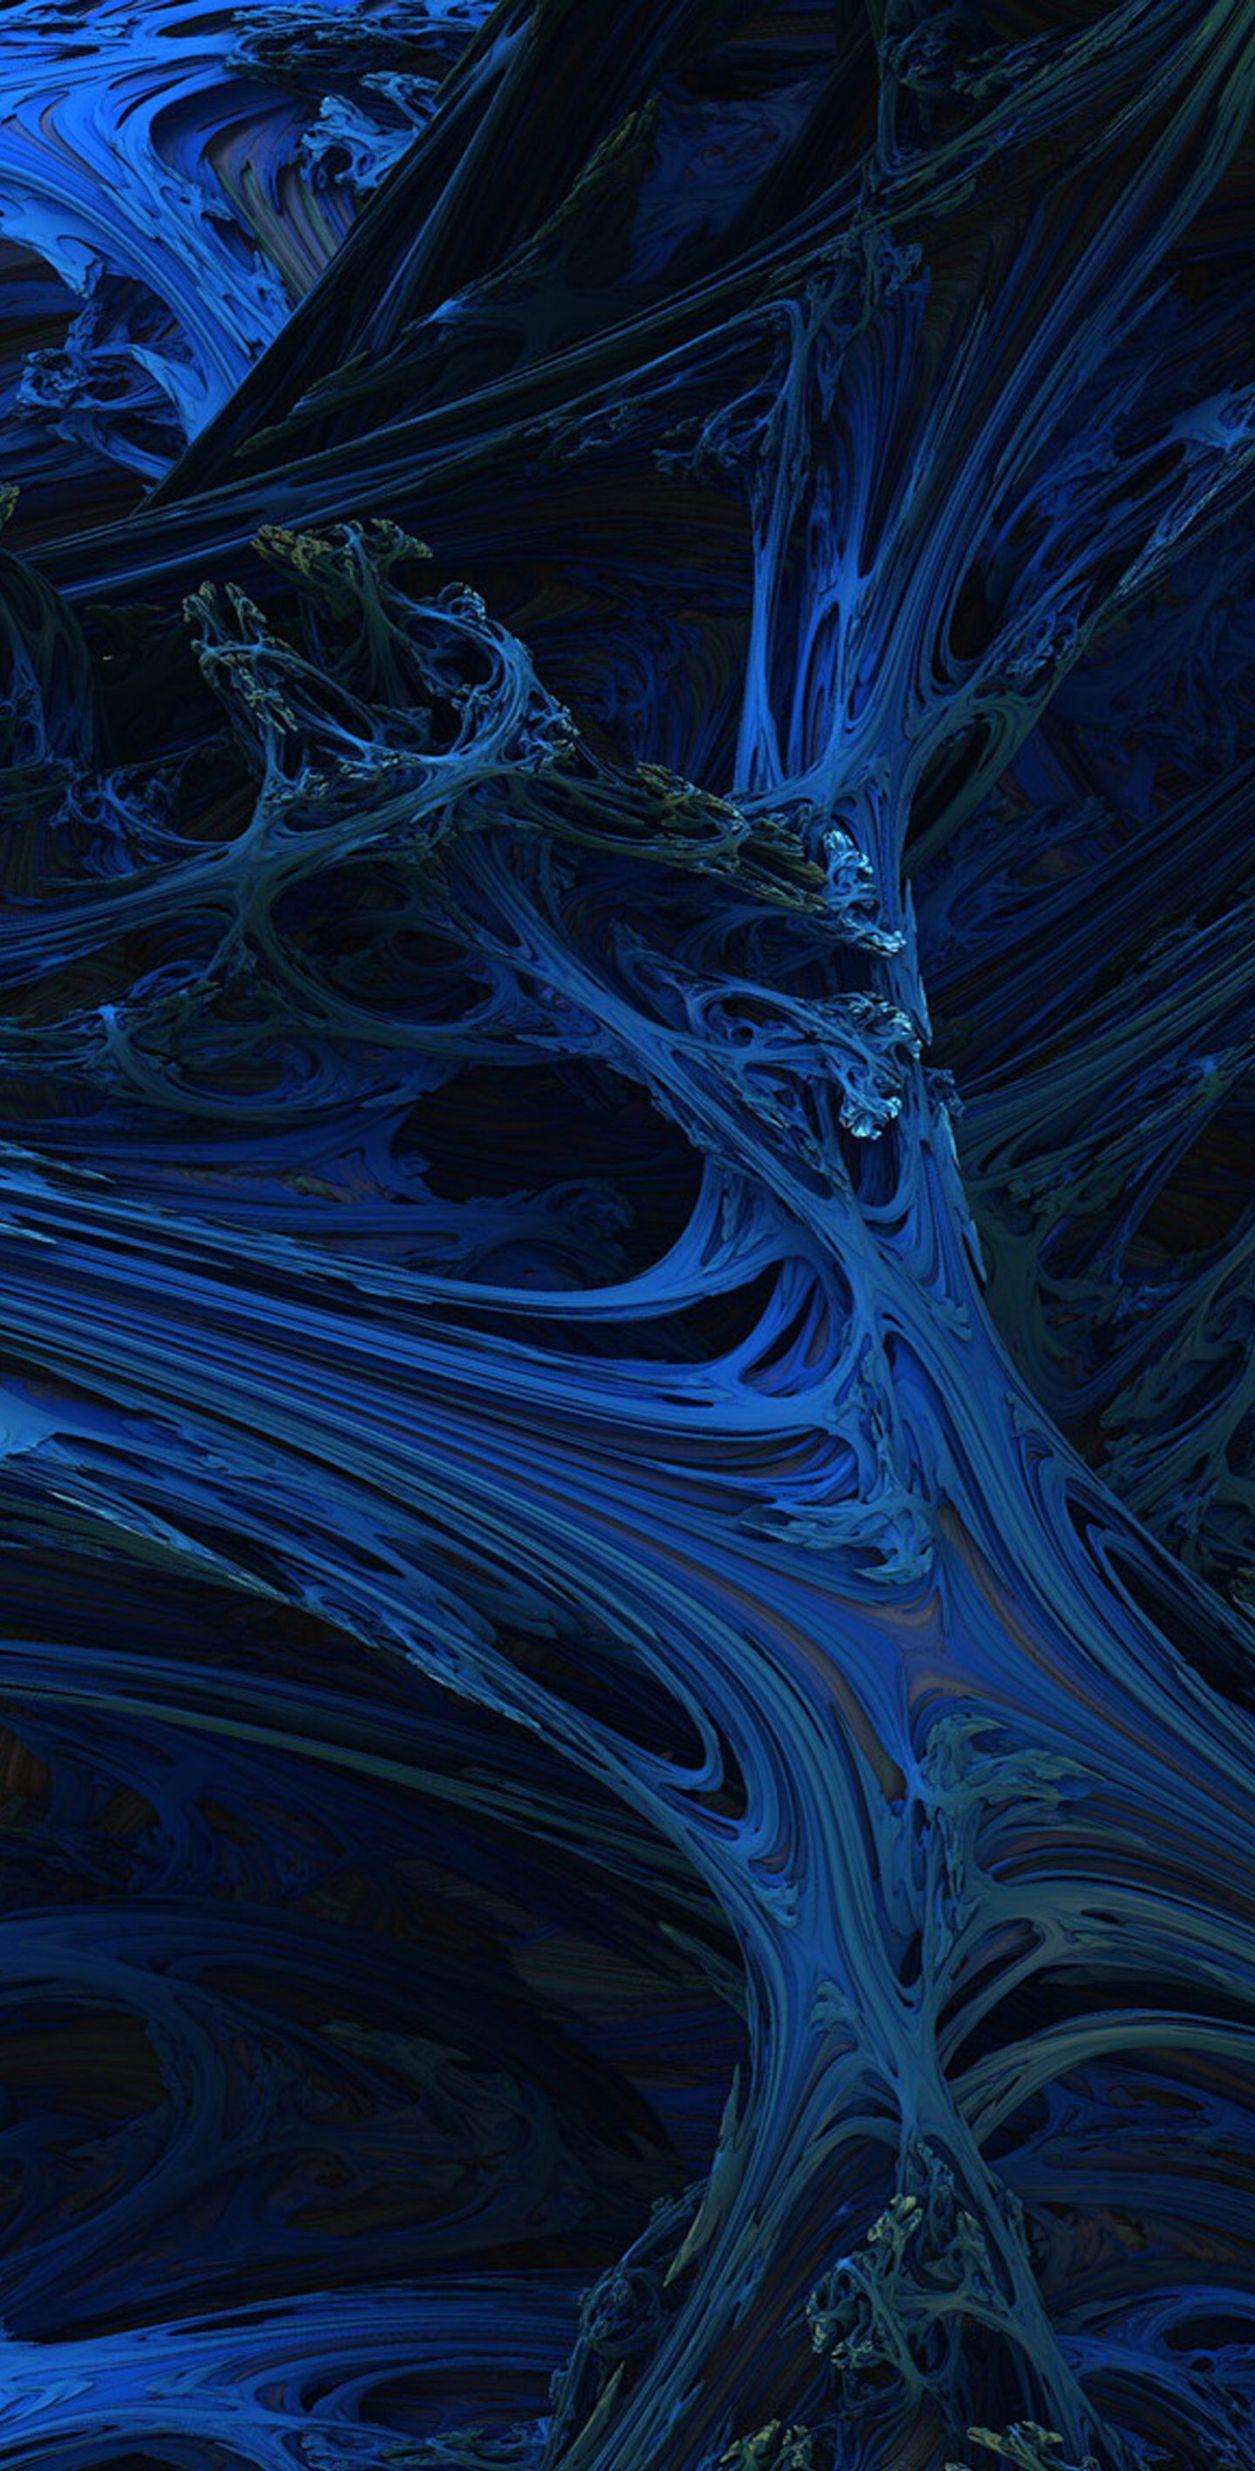 Dark, Blue, wallpaper, pattern, galaxy, colour, abstract